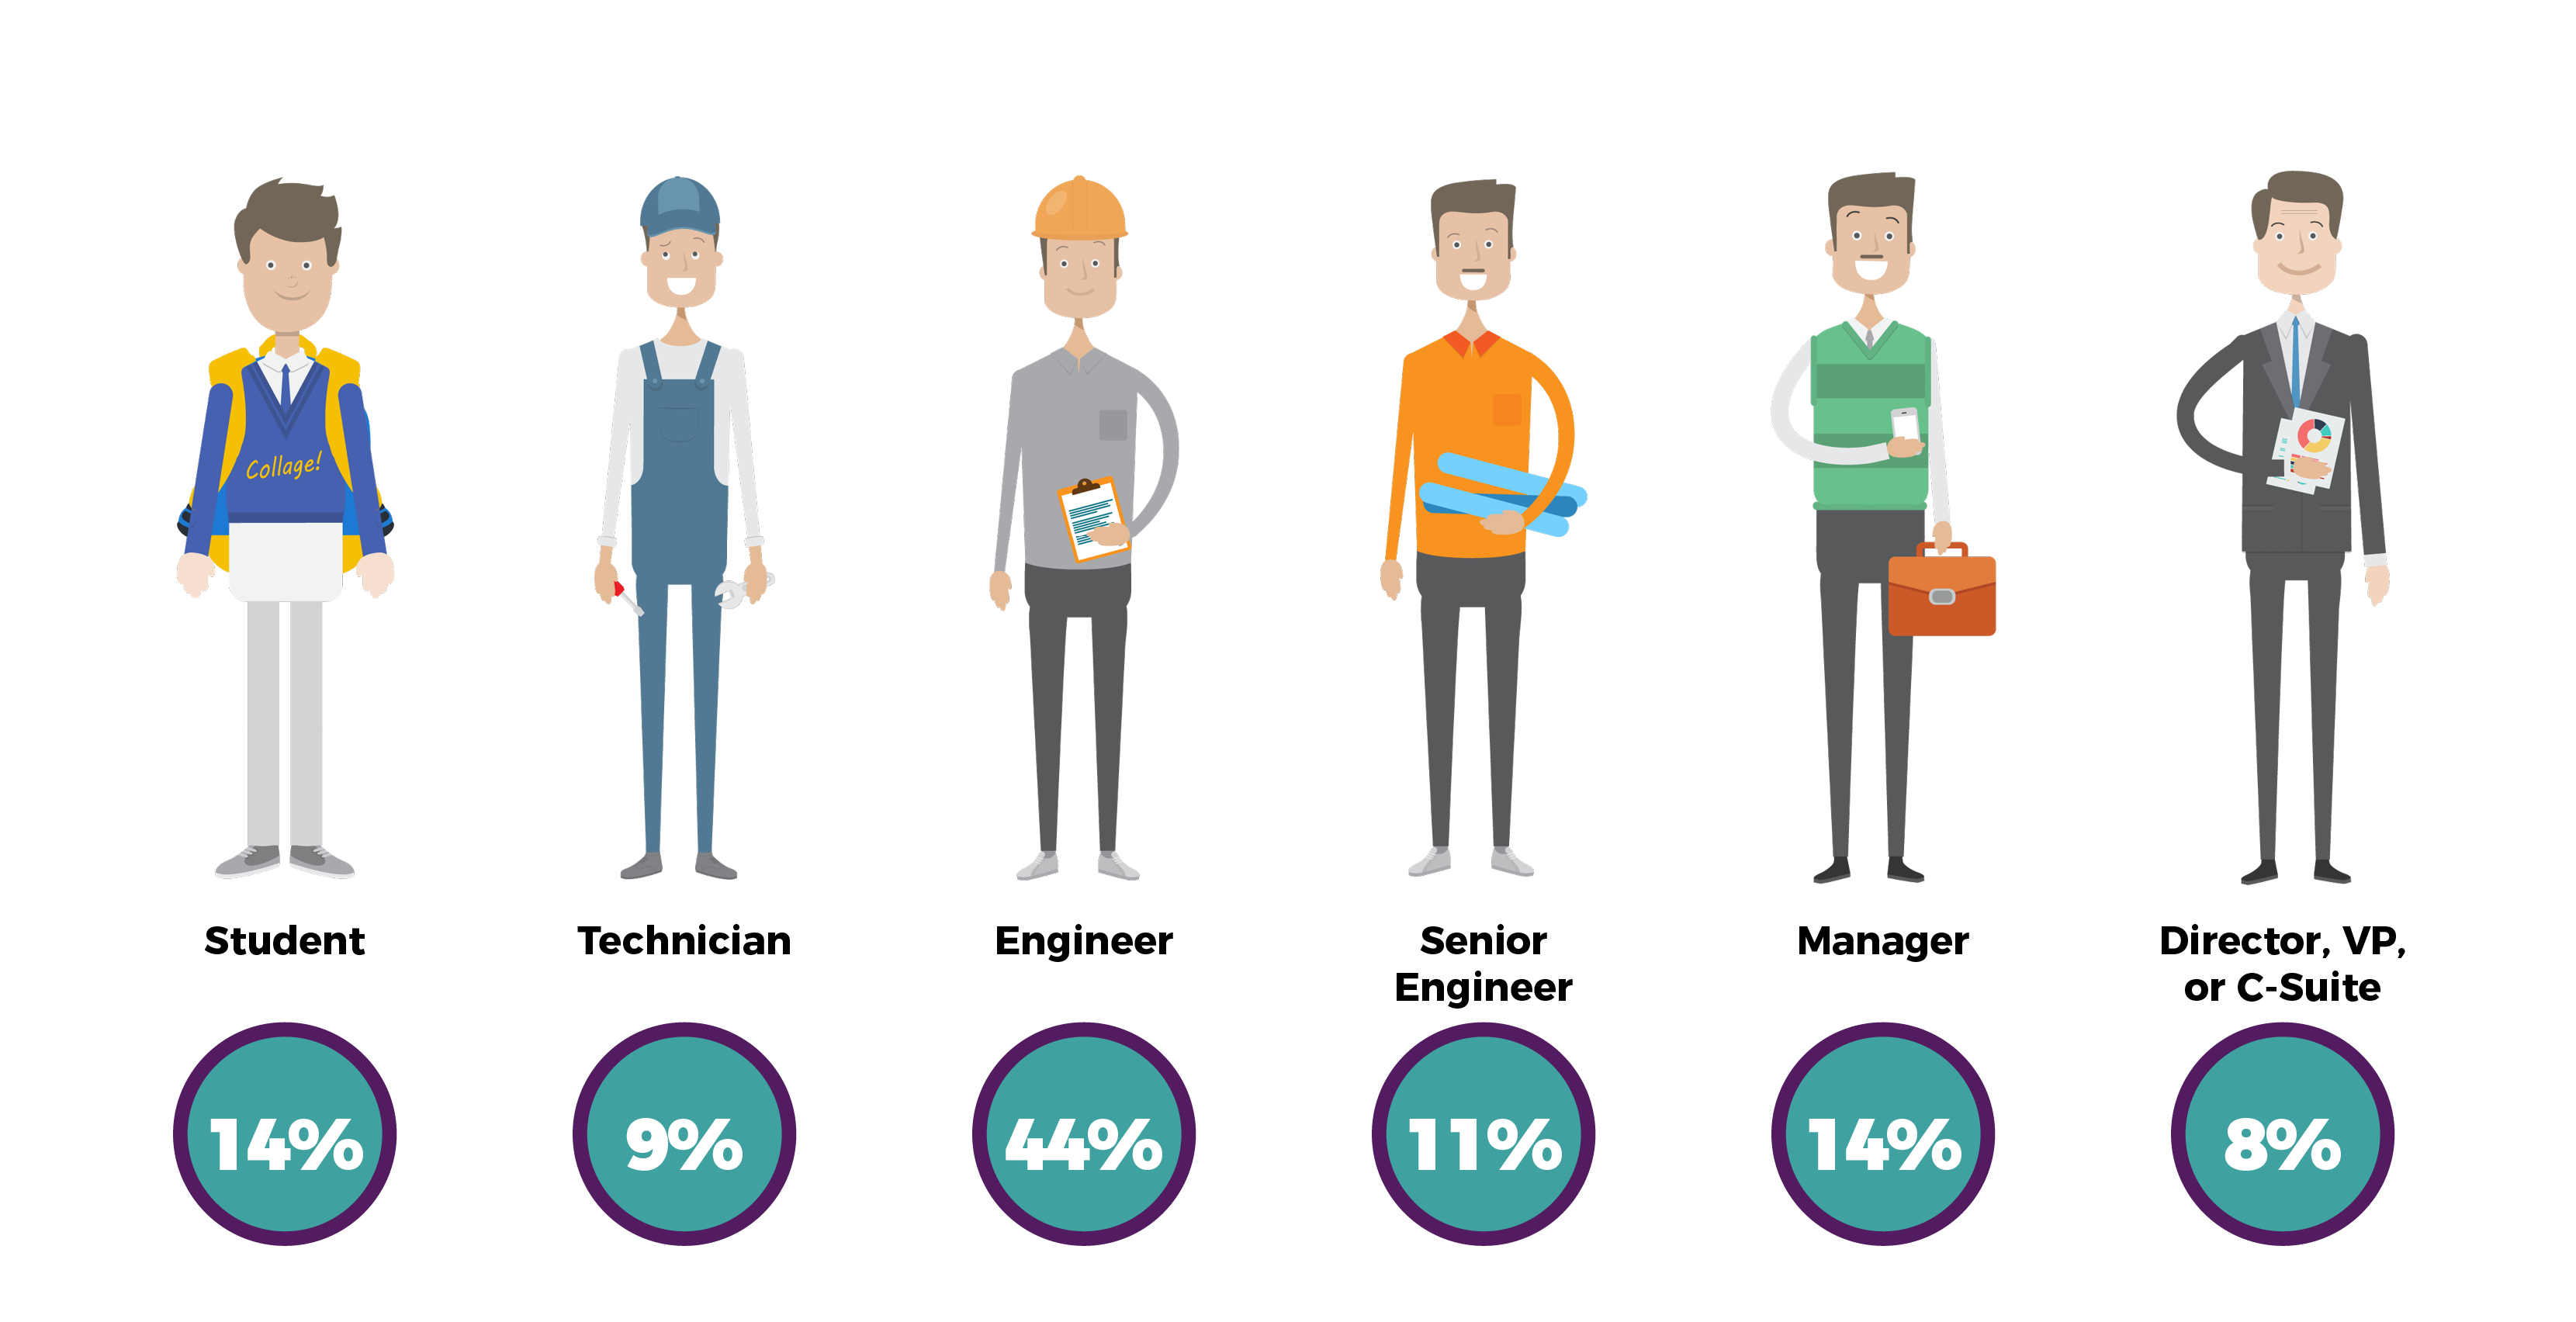 Engineering.com Job Role Data